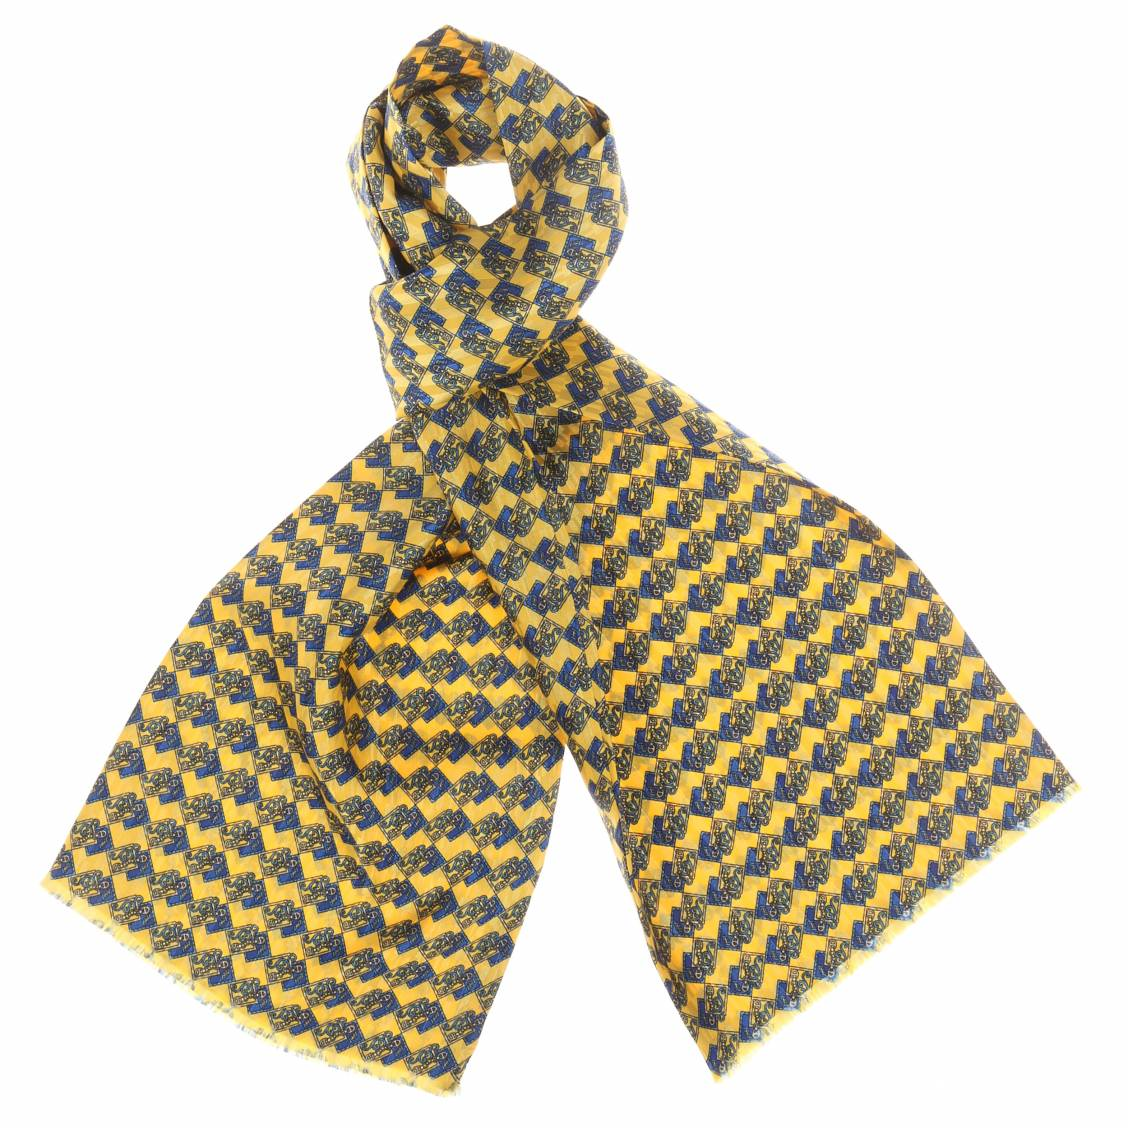 echarpe en soie jaune motifs bleus rue des hommes. Black Bedroom Furniture Sets. Home Design Ideas